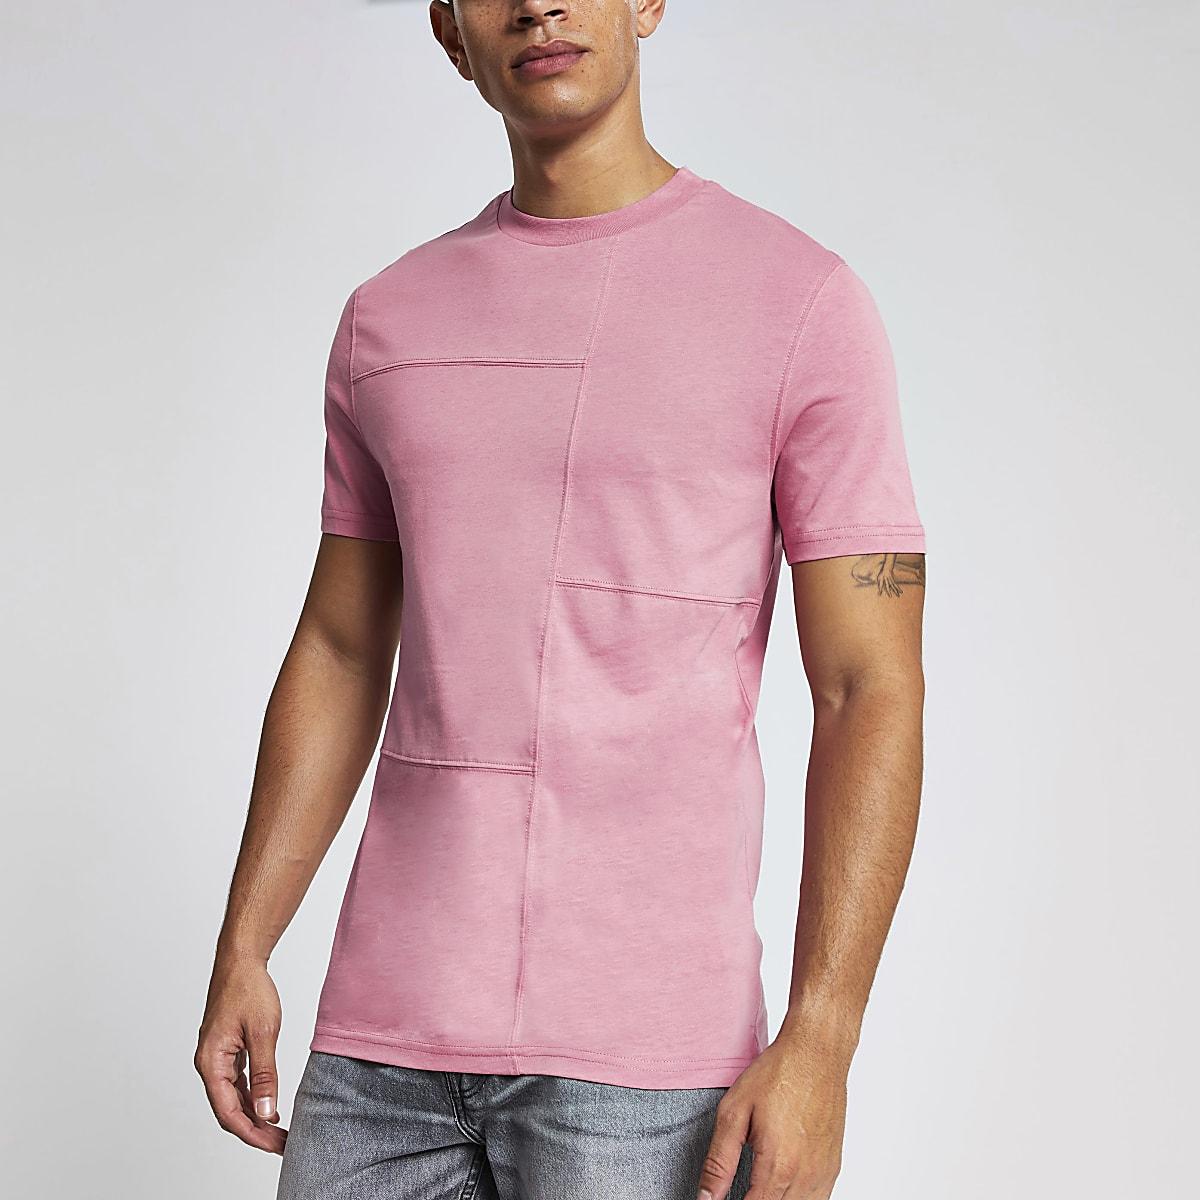 Roze slim-fit T-shirt met gestikte panelen